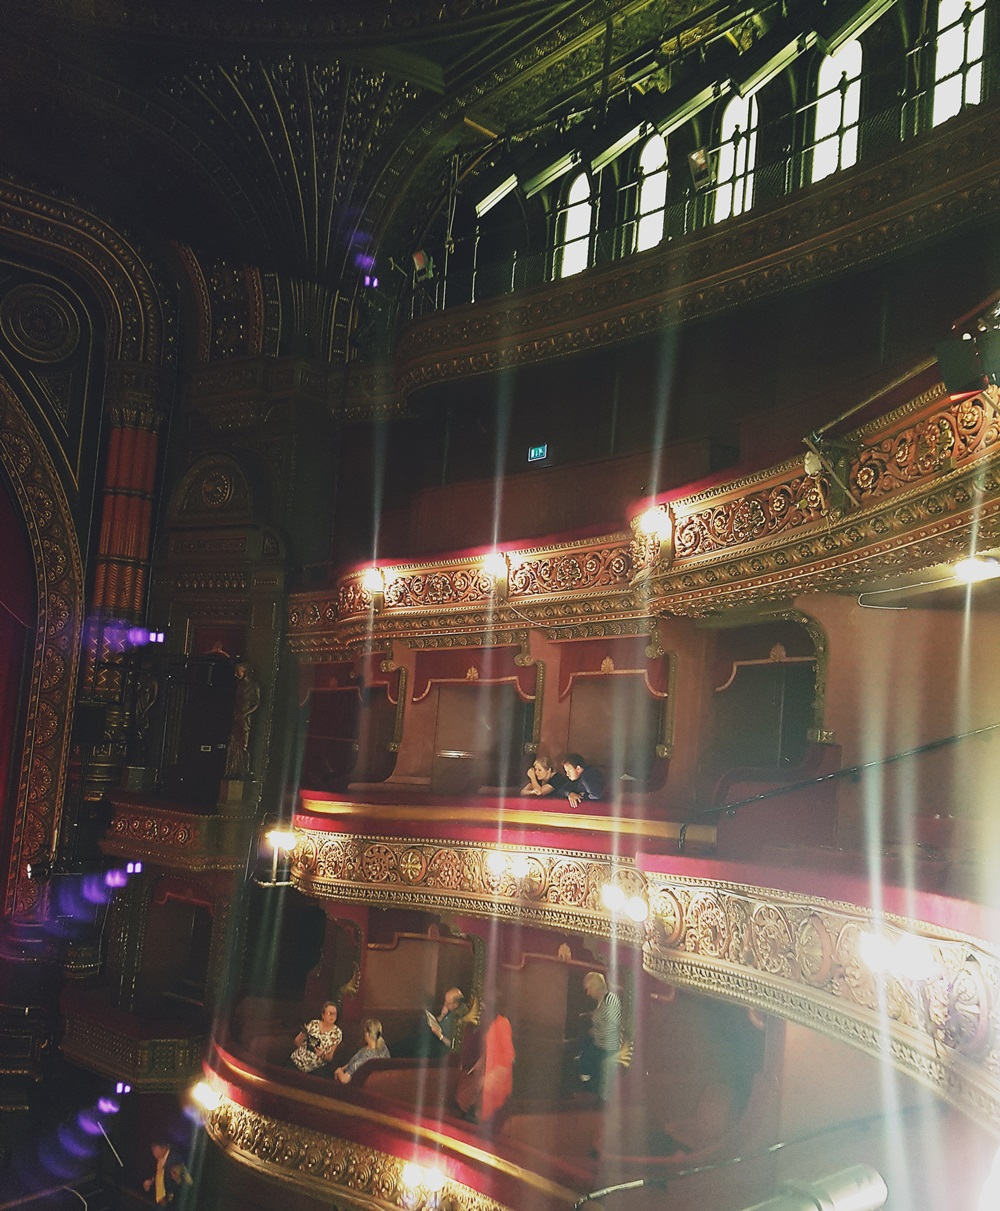 Interior at The Grand Theatre Leeds